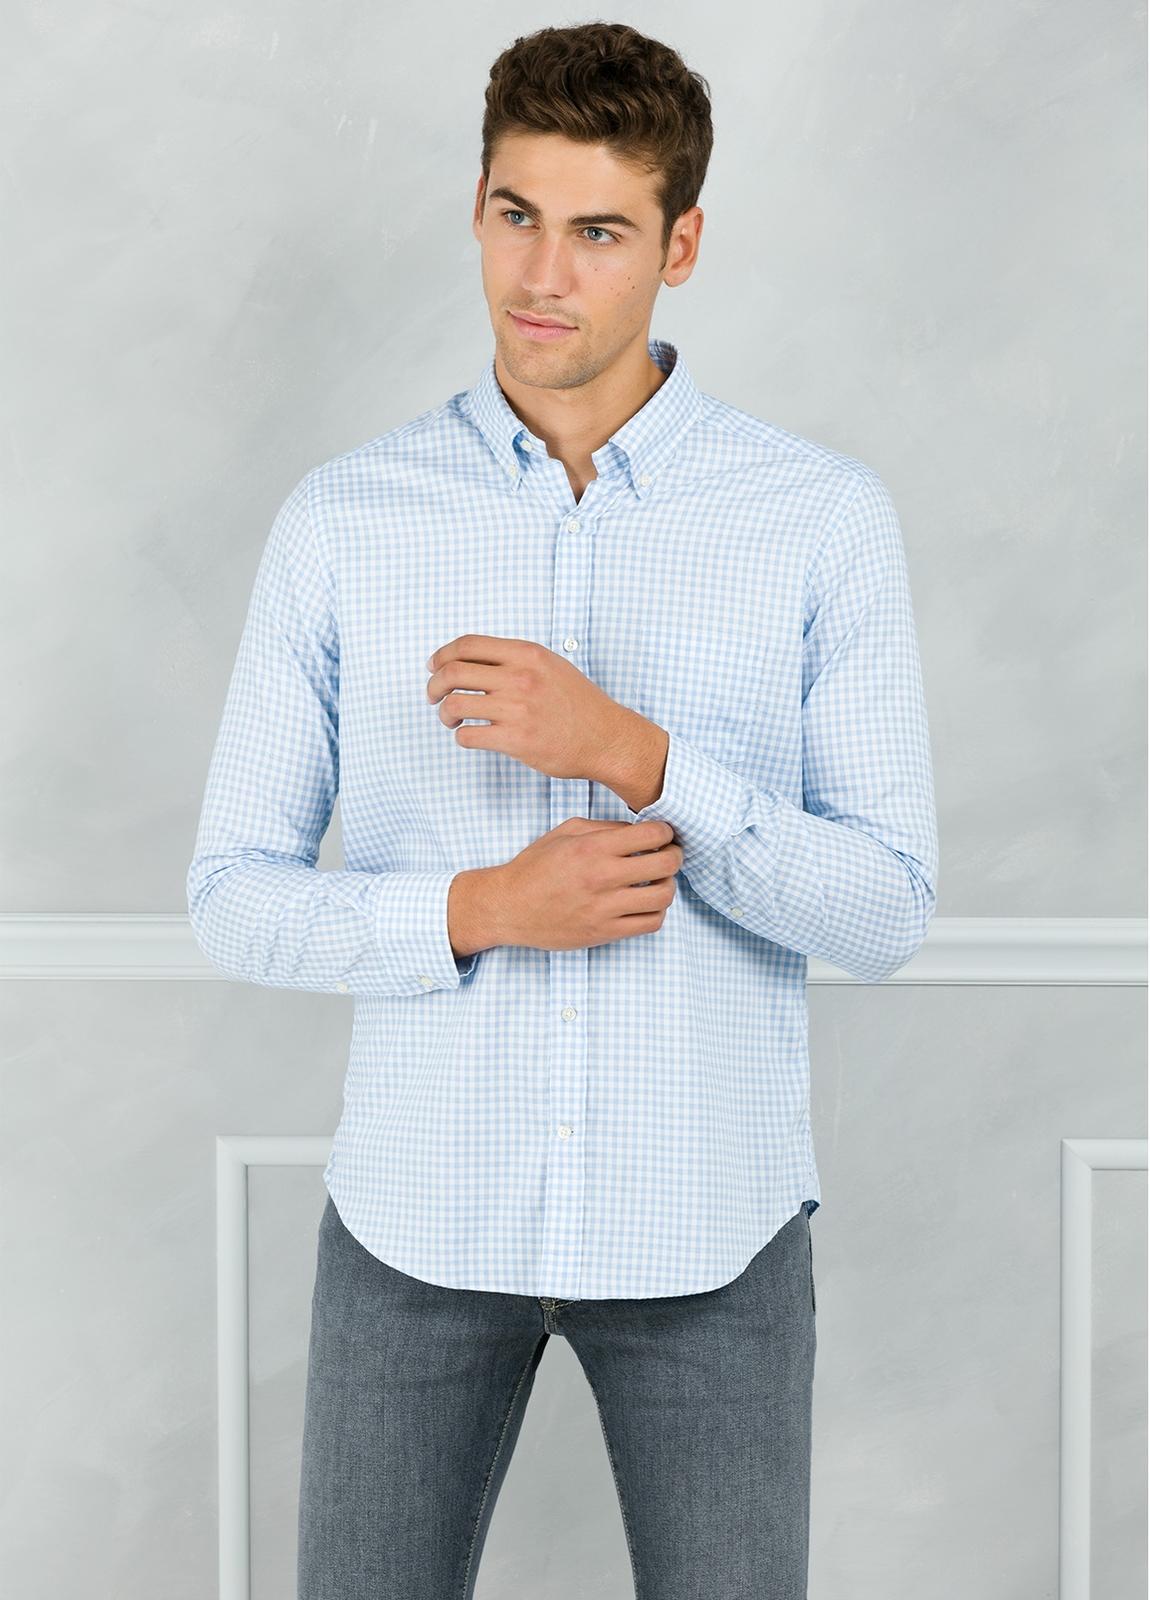 Camisa Leisure Wear REGULAR FIT Modelo BOTTON DOWN cuadro vichy color celeste. 100% Algodón. - Ítem1